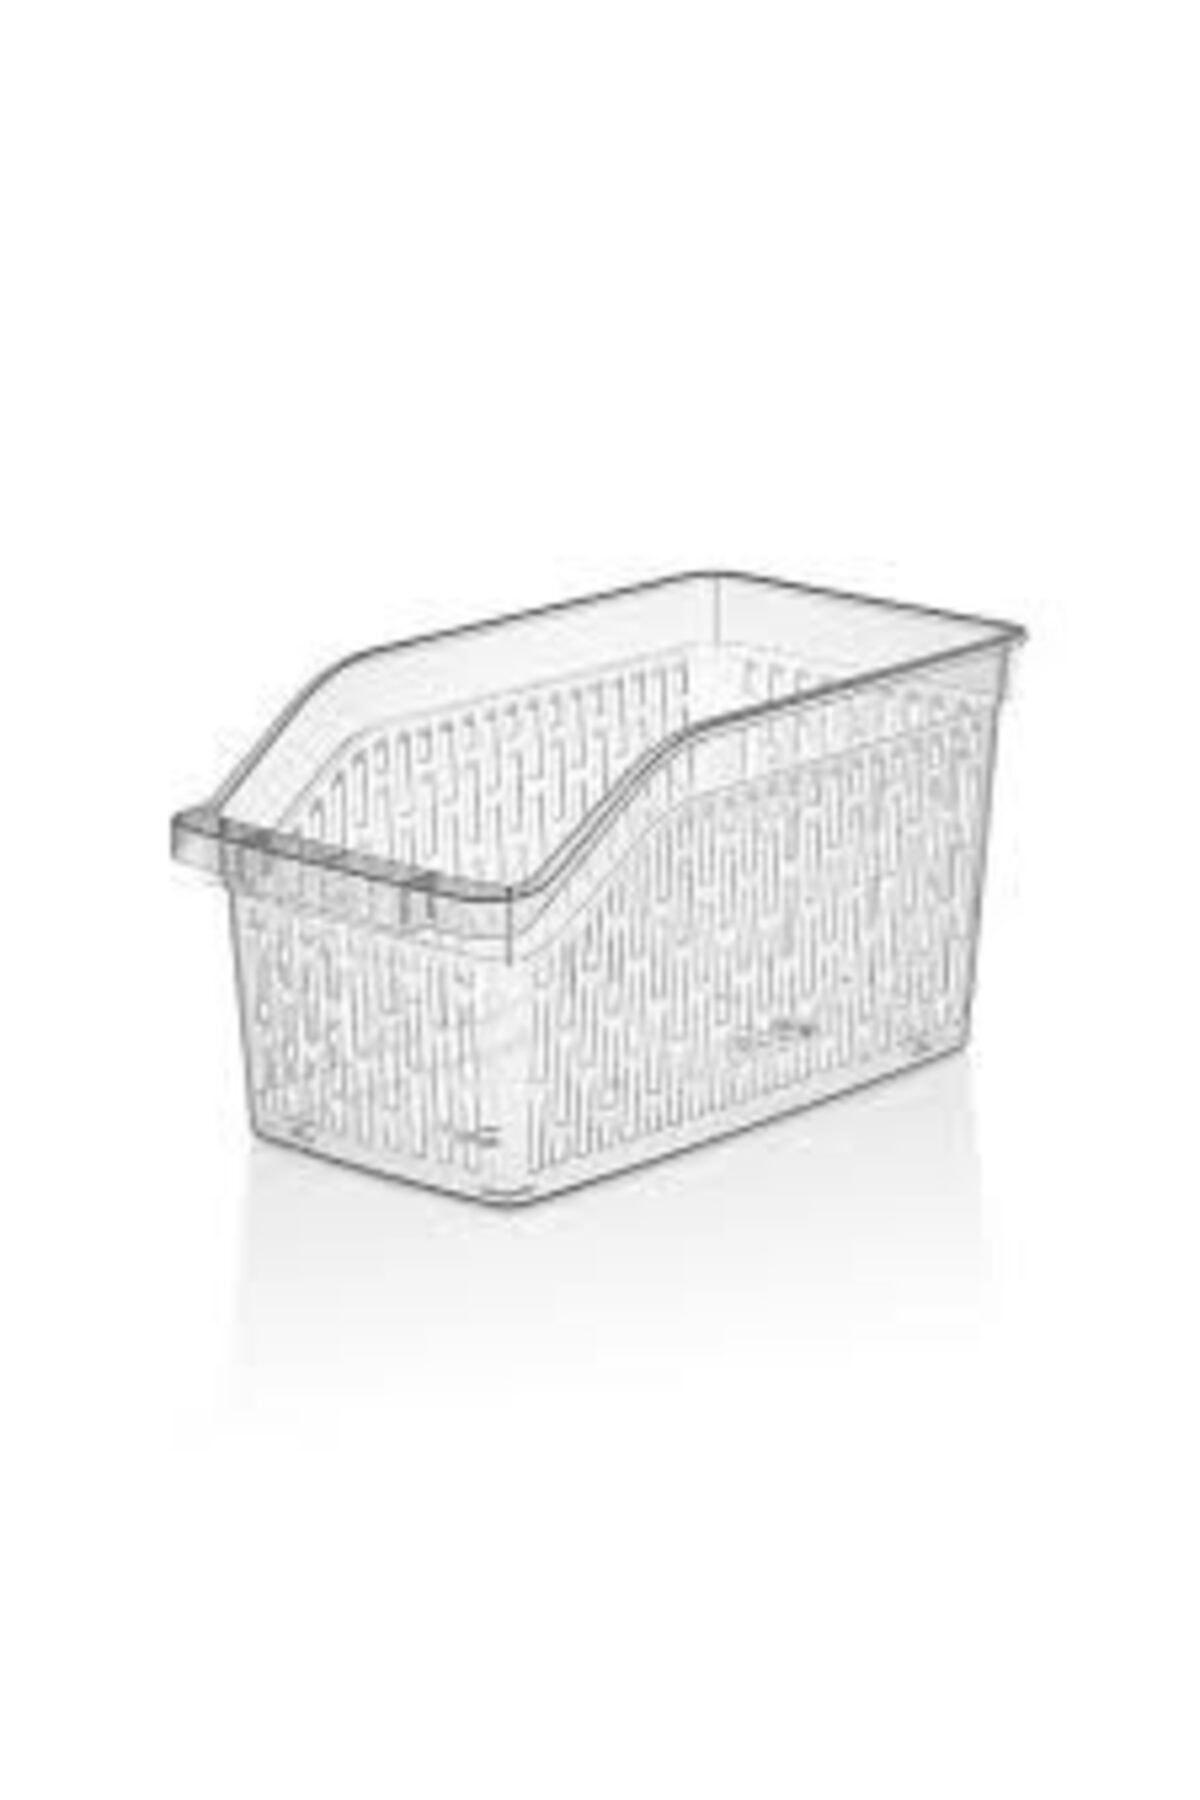 Sas Buzdolabı Sepeti Dolap Içi Düzenleyici Sepet Organizer Şeffaf 6 Adet 30x17x16 2